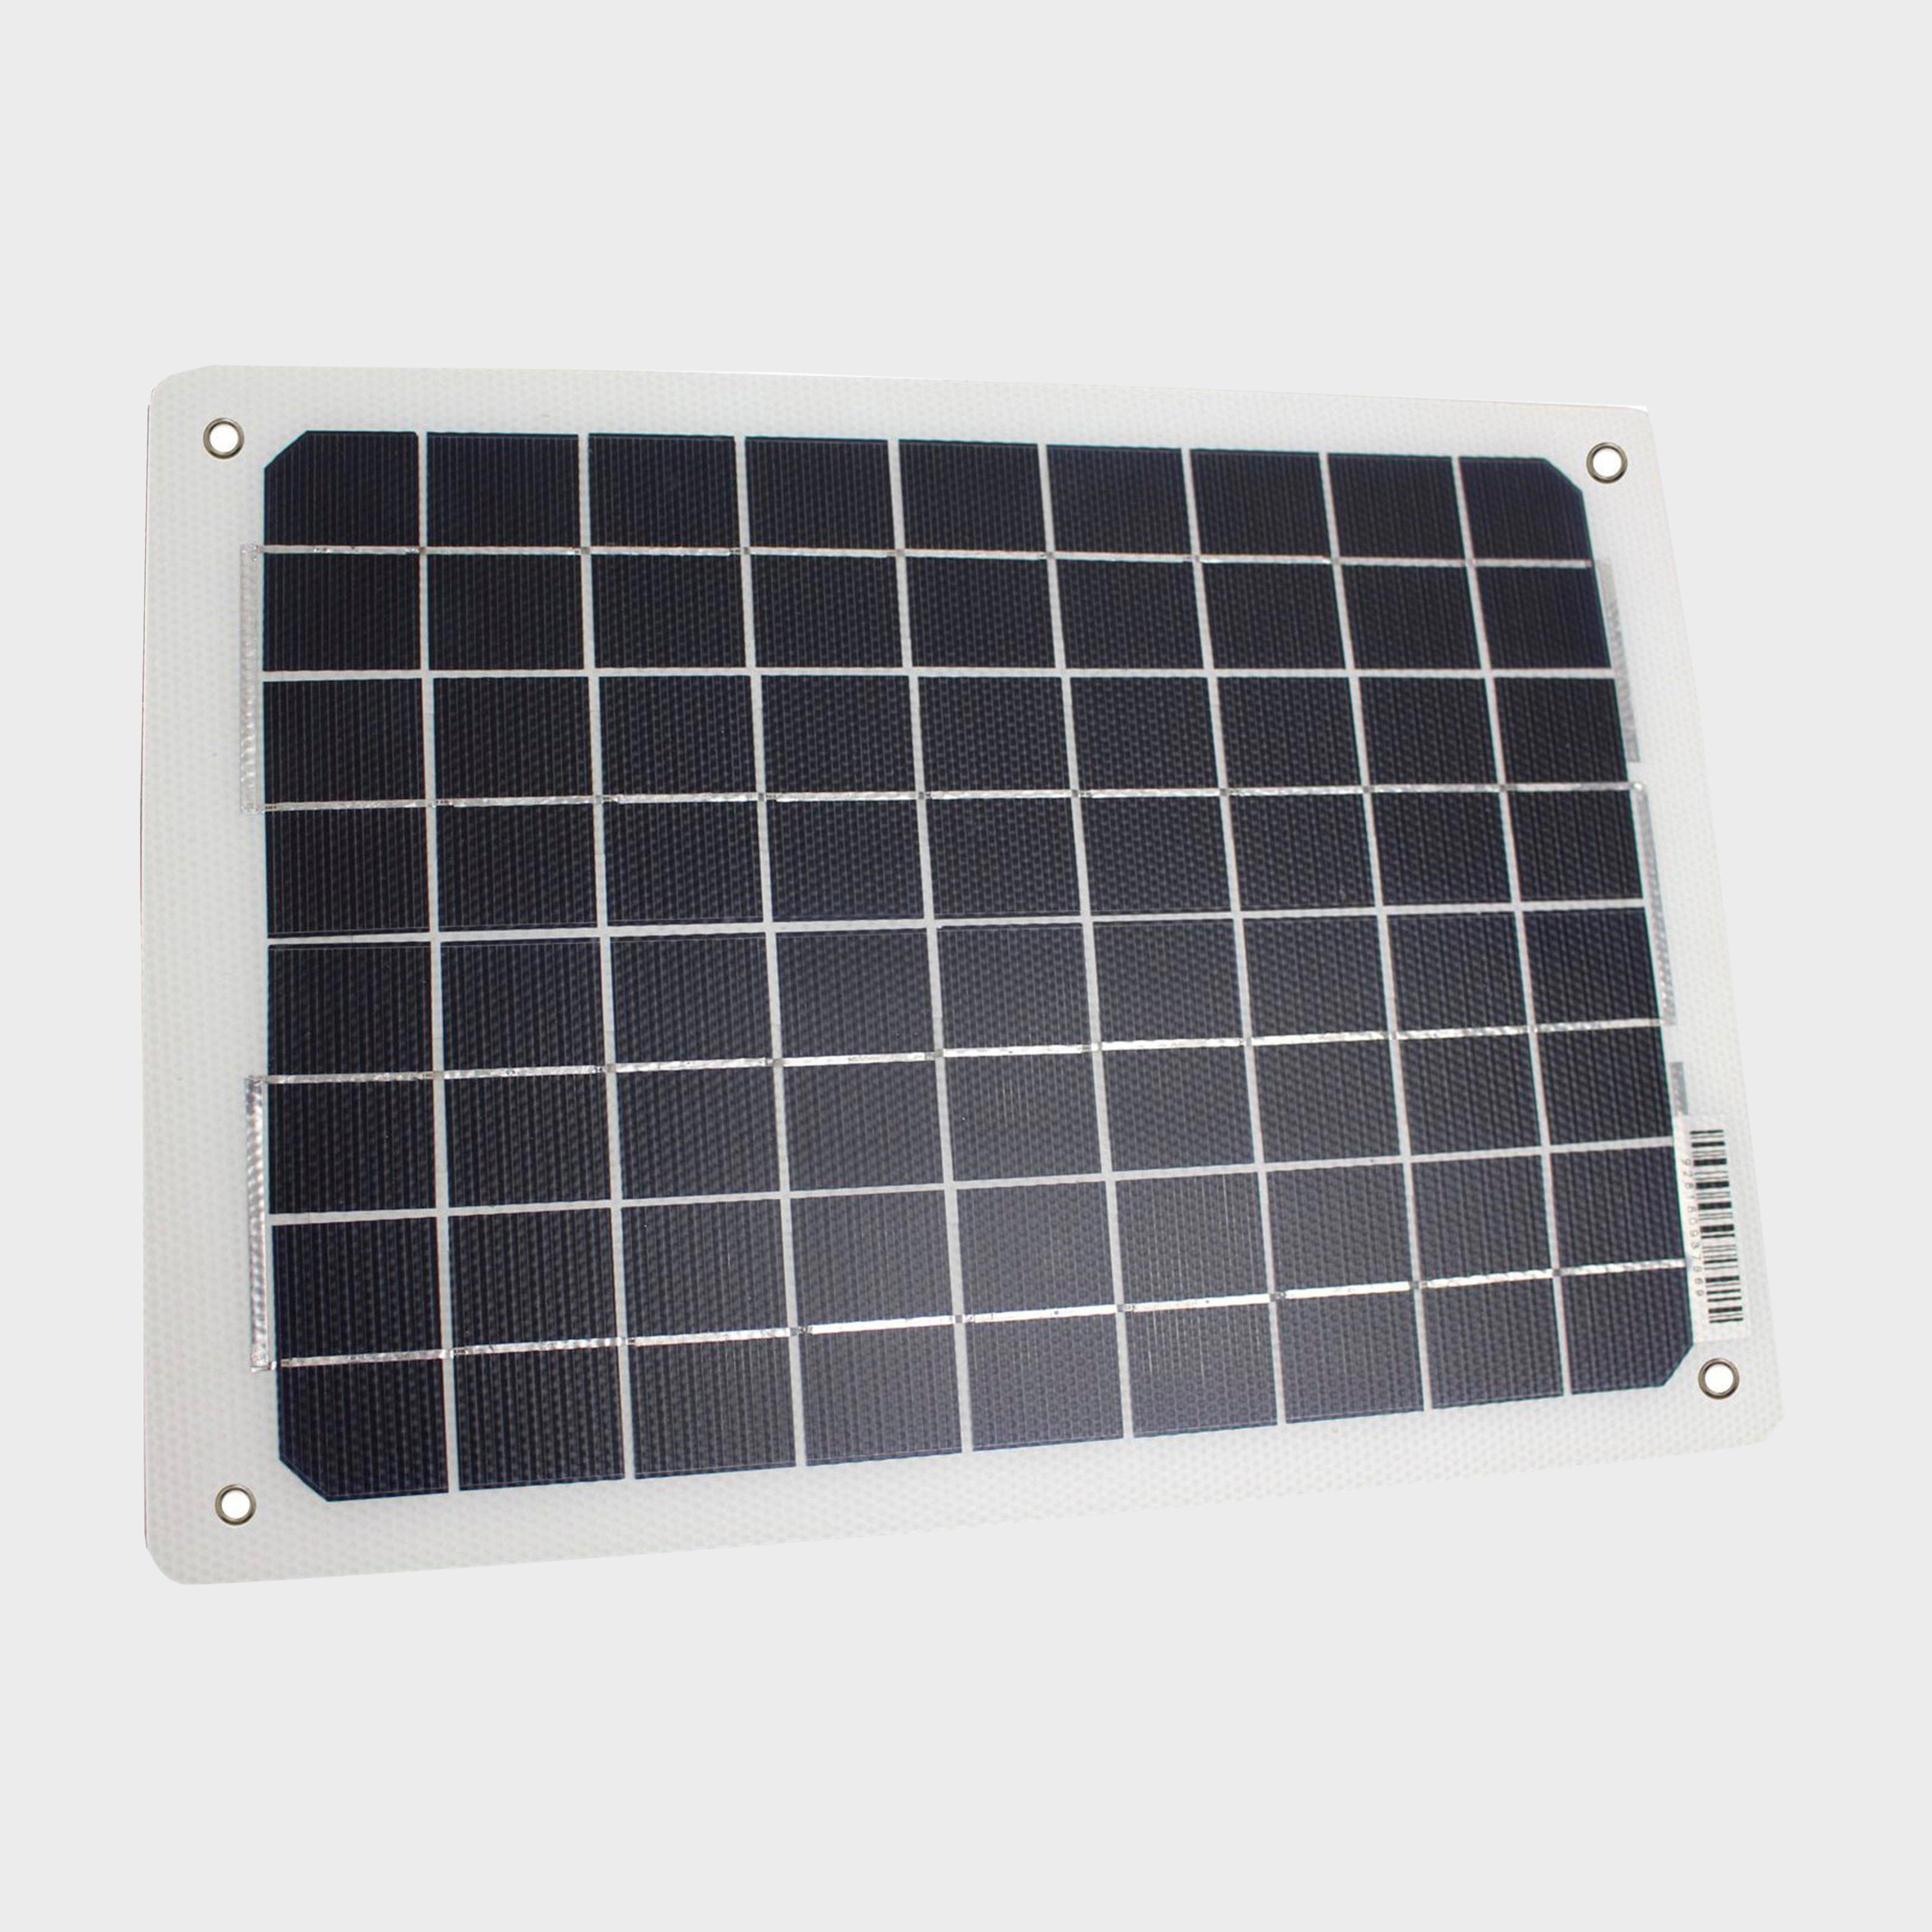 Falcon 10W Portable Solar Panel Battery Charger - Multi/Panel, Multi Coloured